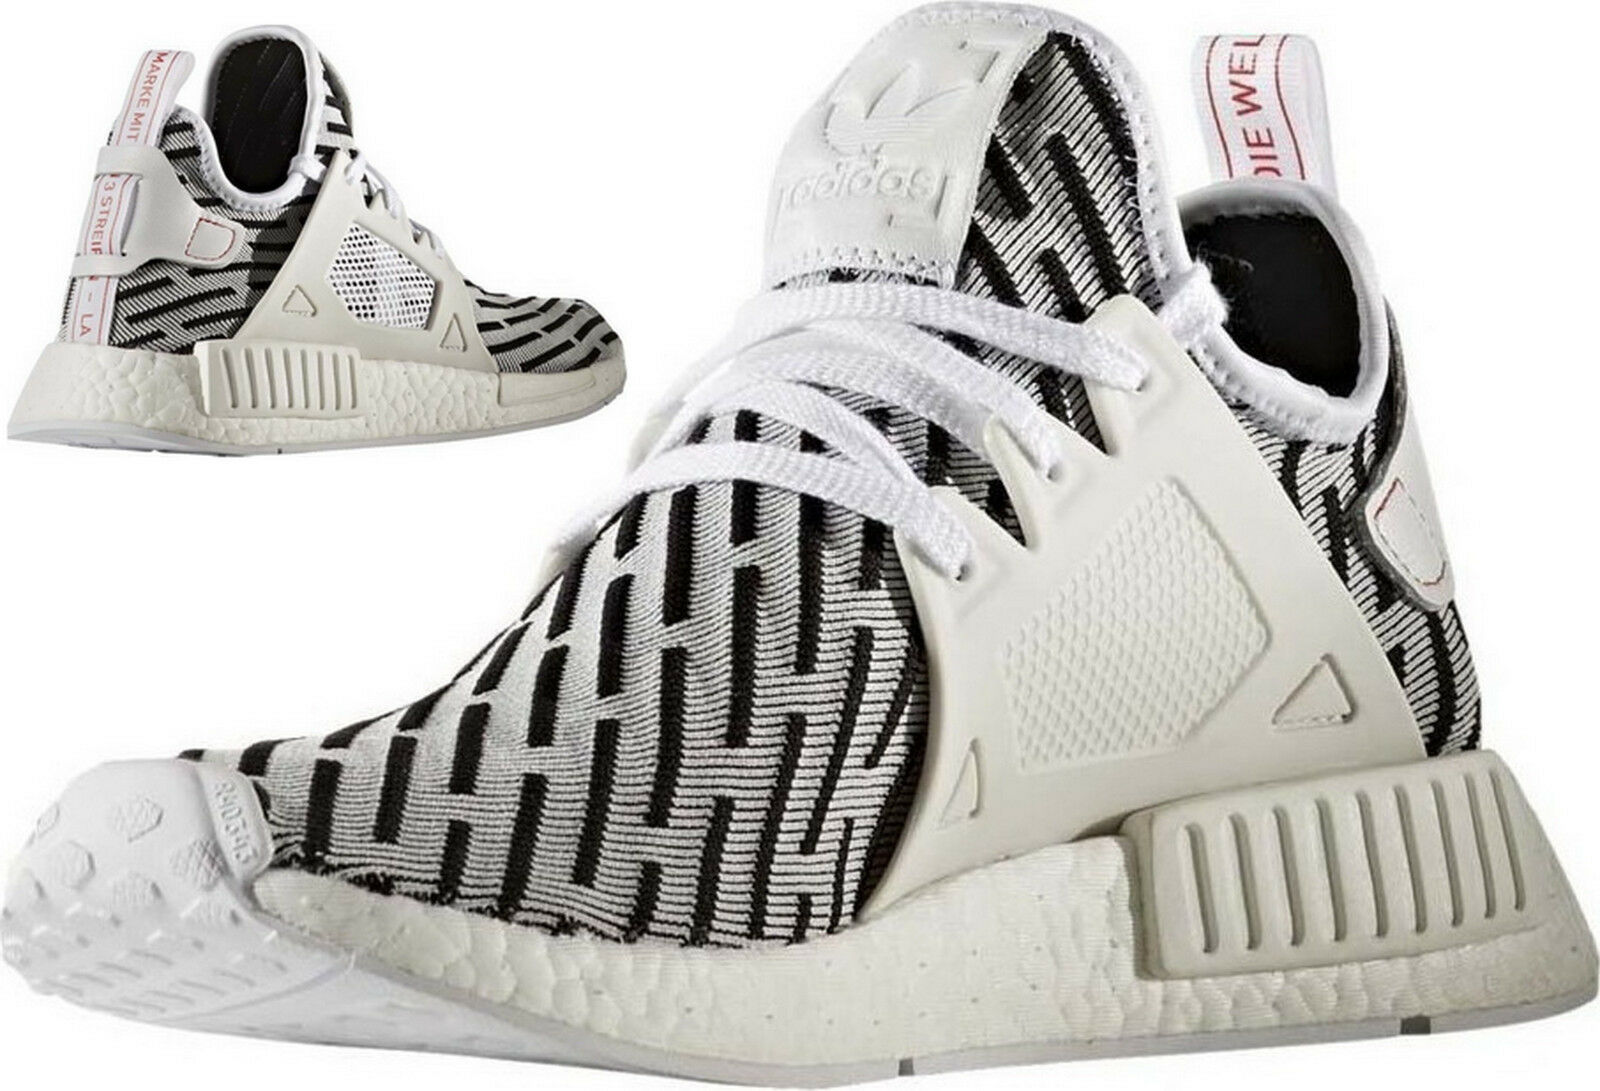 Adidas NMD XR1 Originals Primeknit  Zebra  Sneaker Runner Boost BB2911